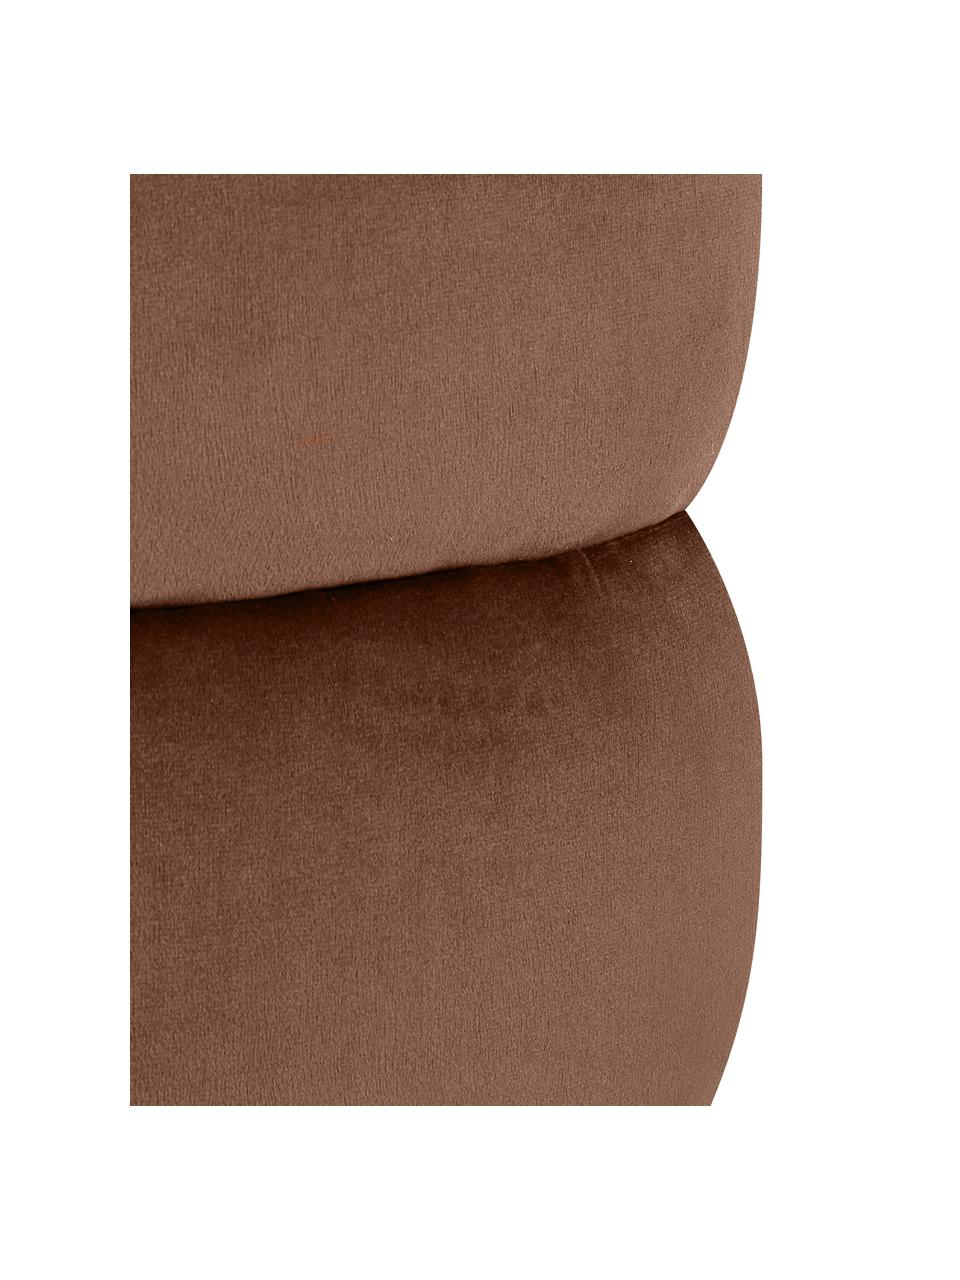 Samt-Hocker Alto, Bezug: Samt (Polyester) 30.000 S, Gestell: Massives Kiefernholz, Spe, Samt Braun, Ø 42 x H 47 cm